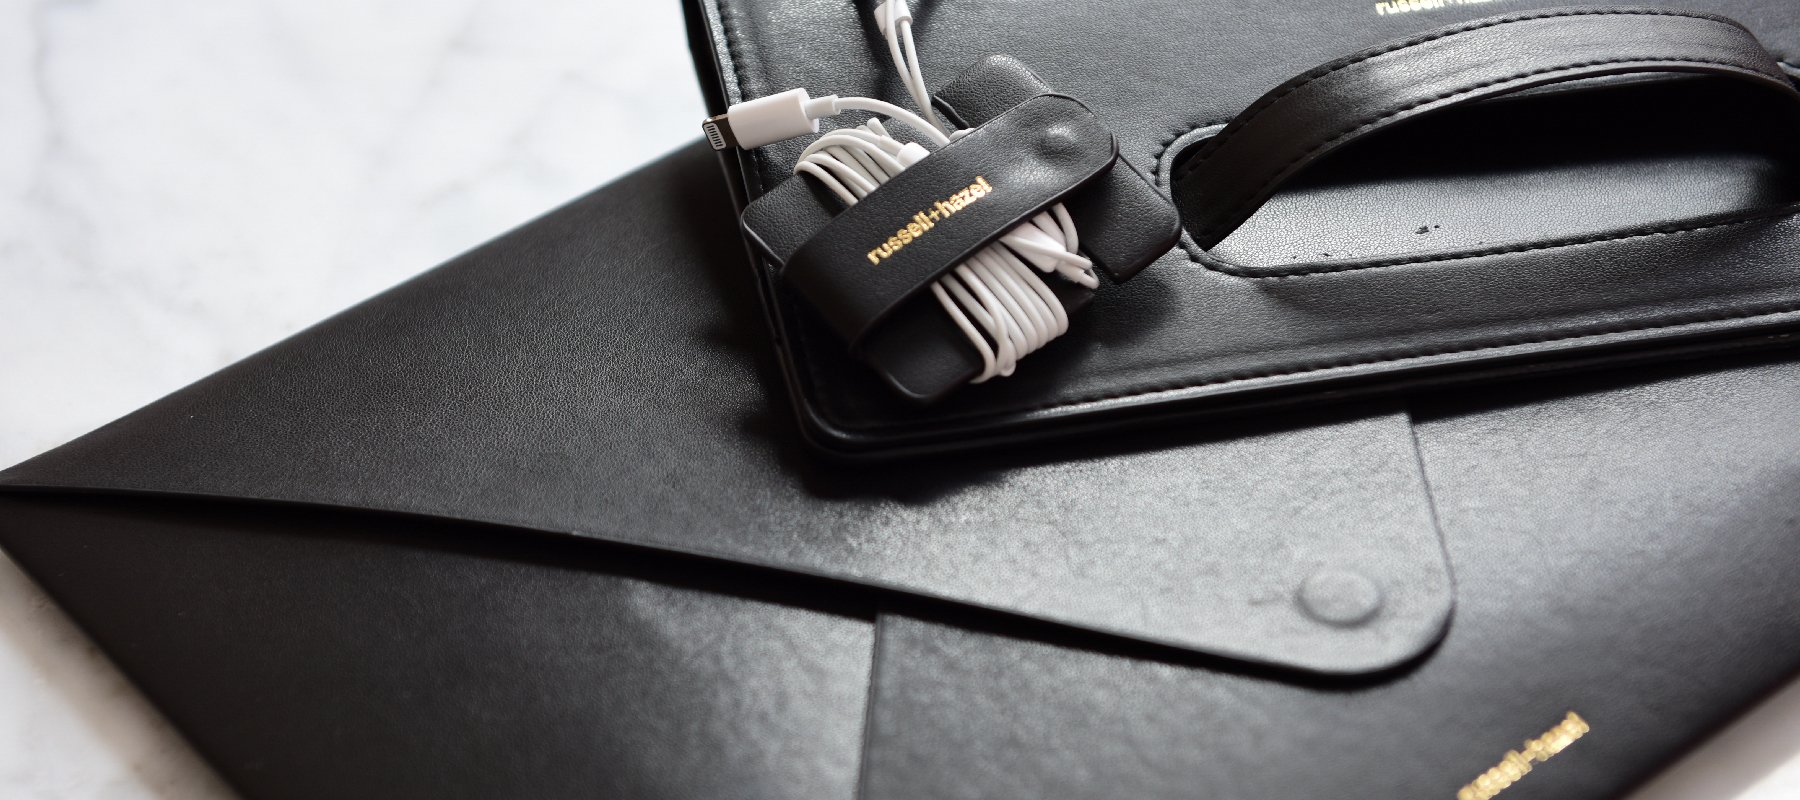 Vegan Leather Accessories - russell+hazel